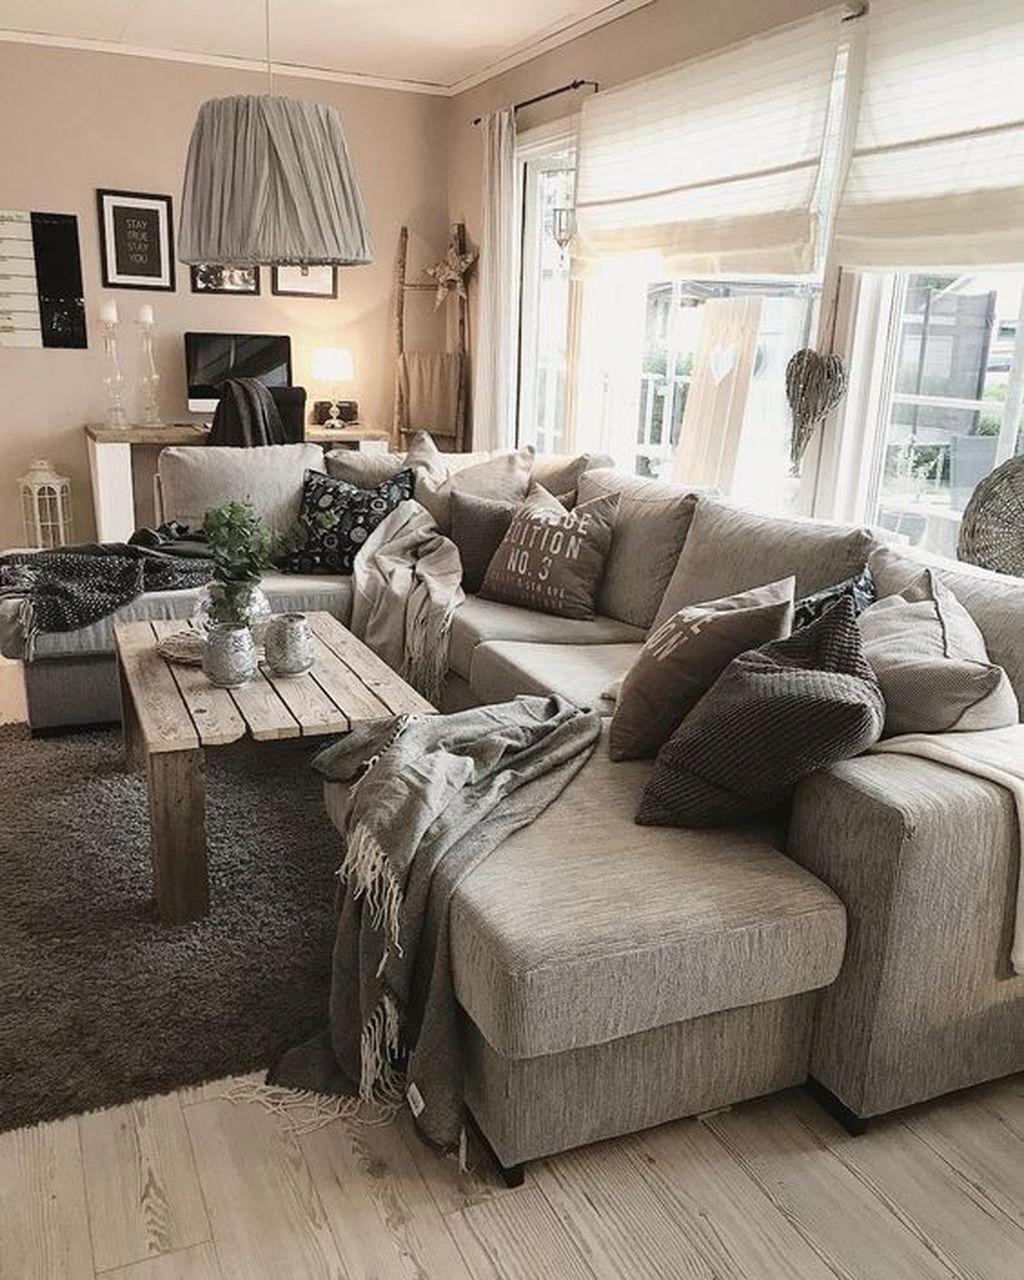 Amazing Bohemian Farmhouse Living Room Design Ideas 27